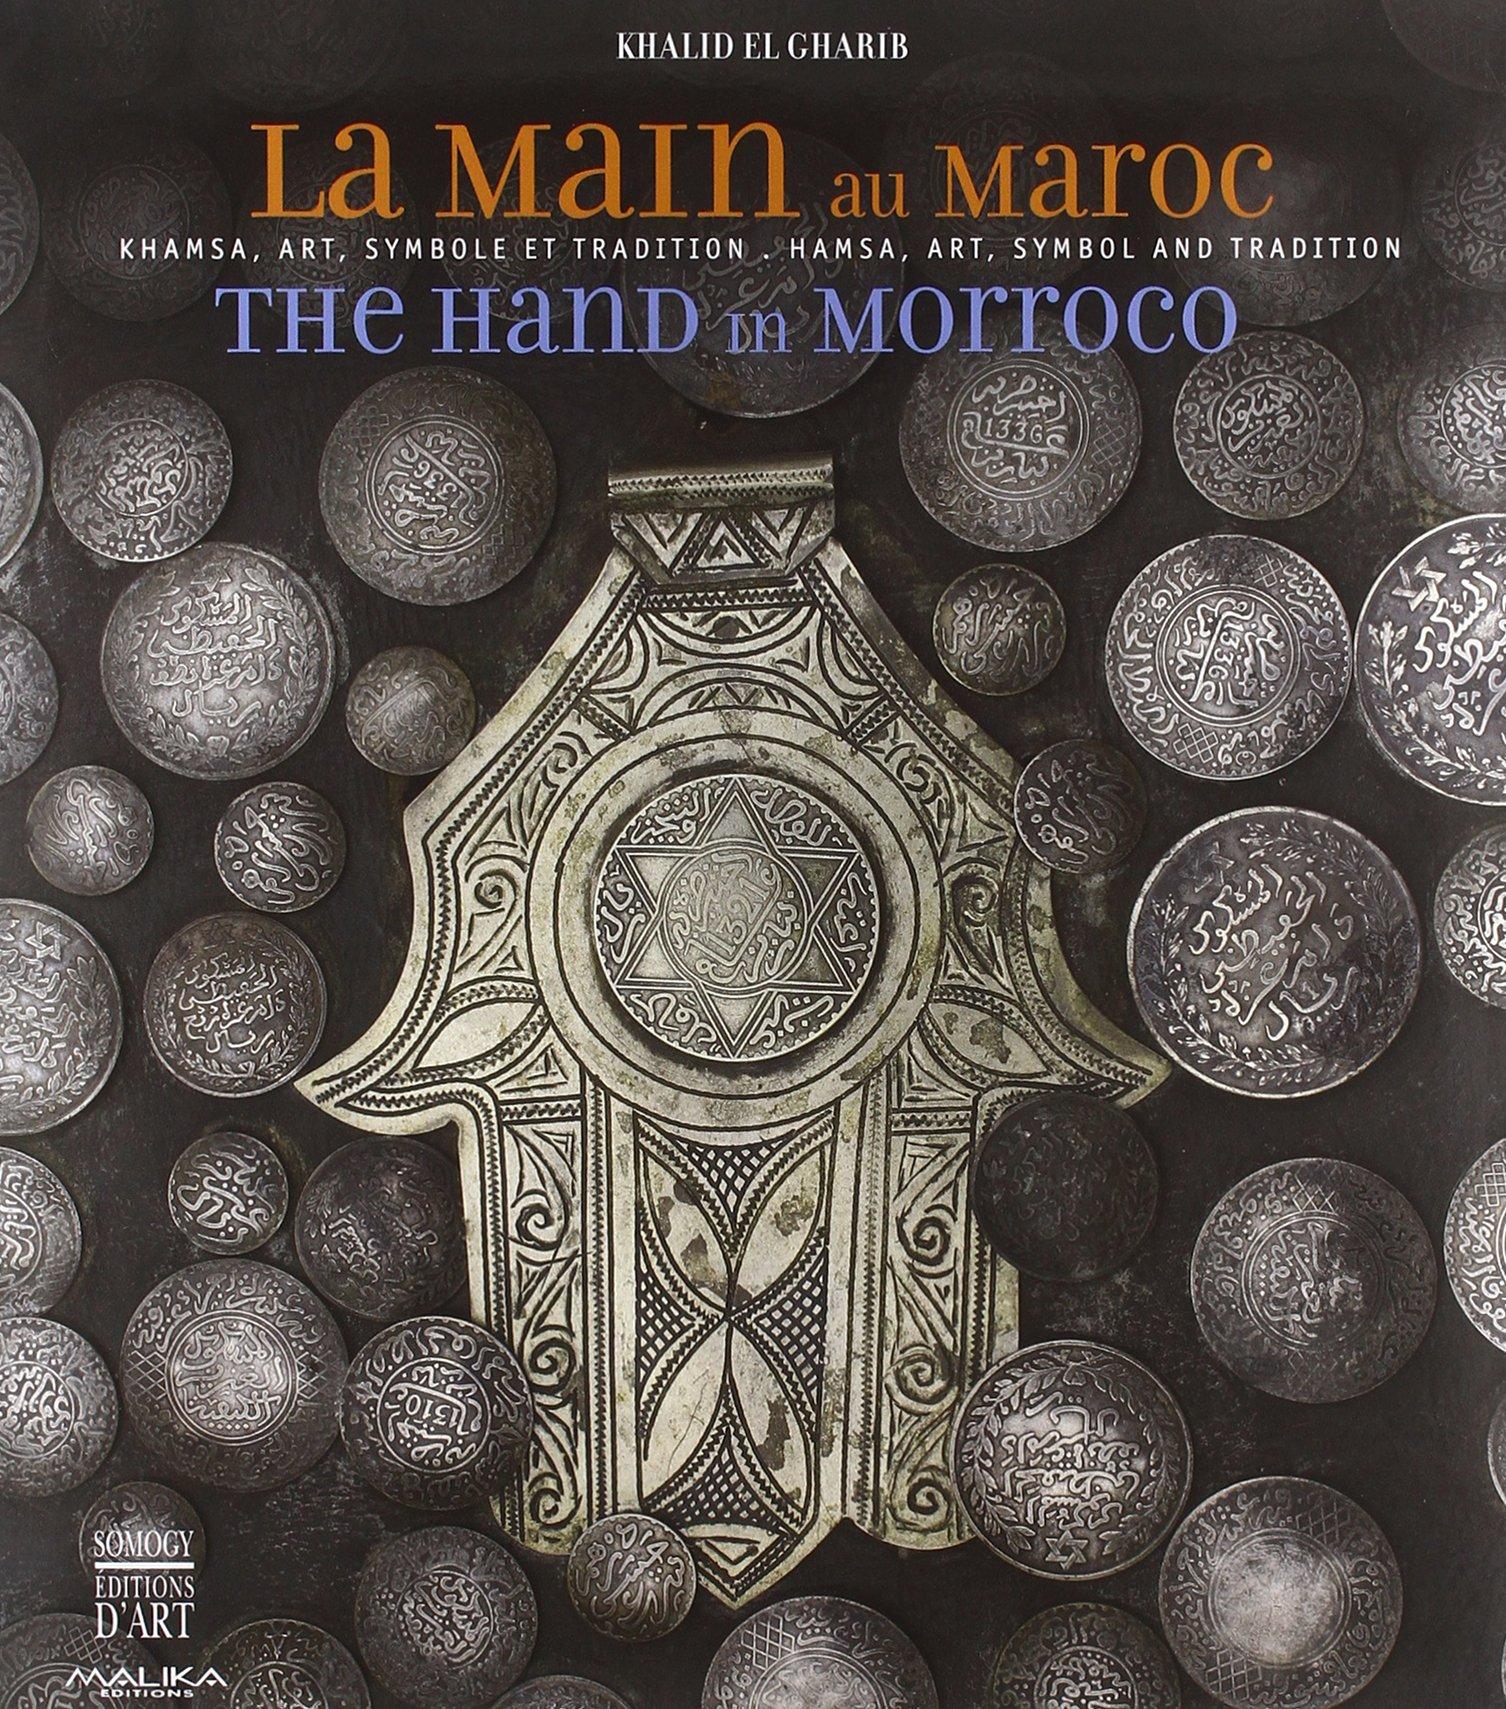 The Hand In Morocco Hamsa Art Symbol And Tradition Khalid El